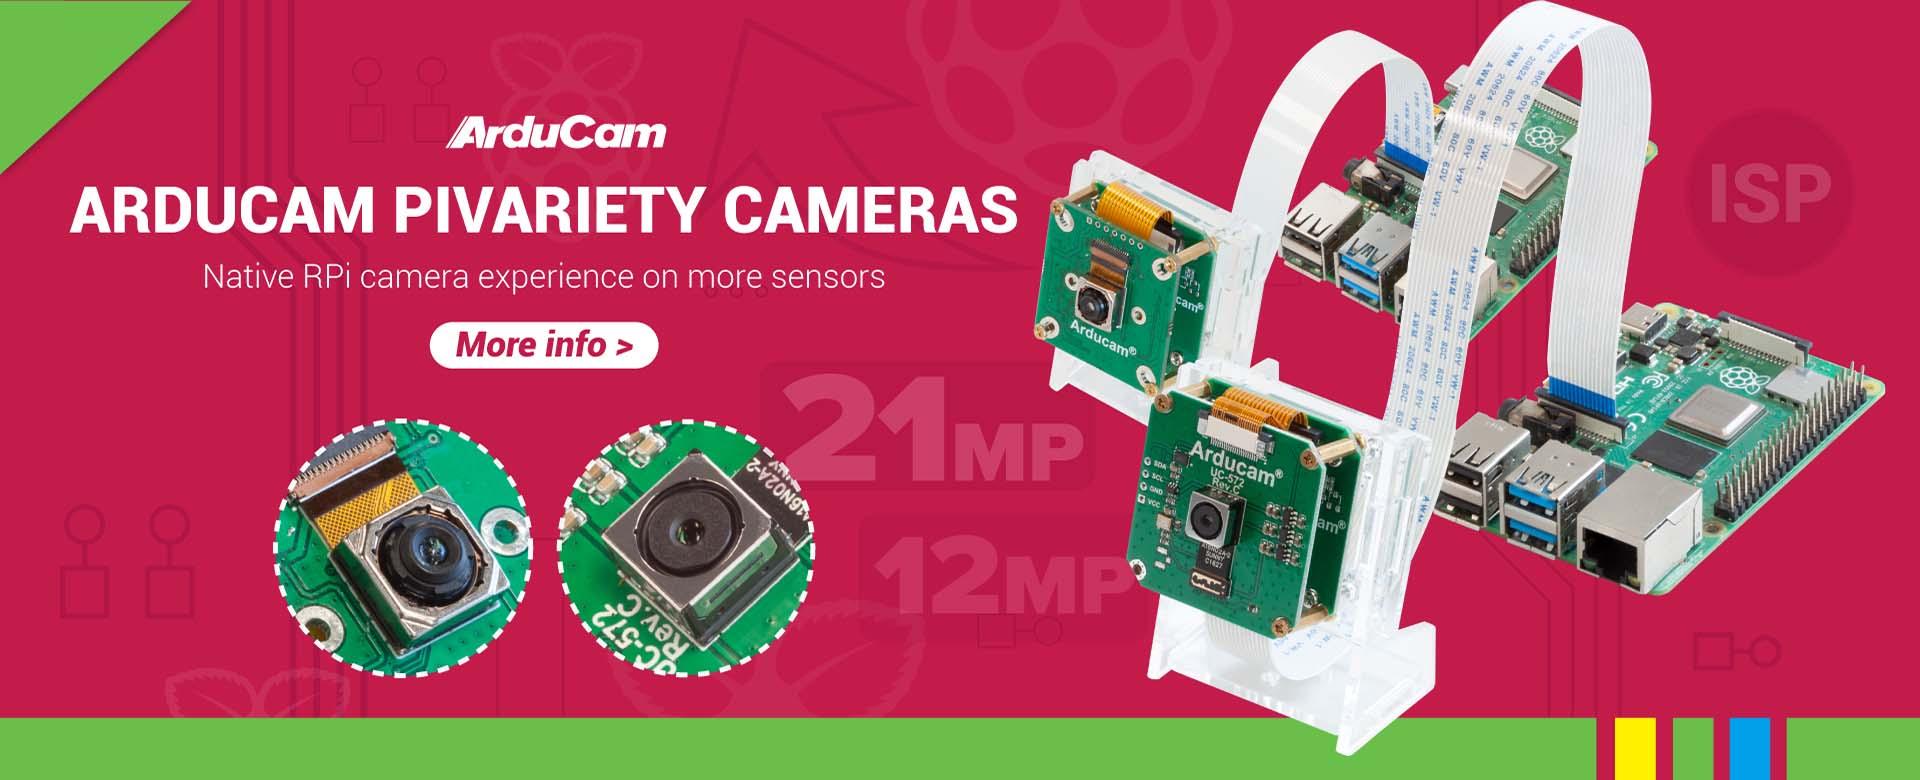 Arducam Pivariety Cameras for Raspberry Pi